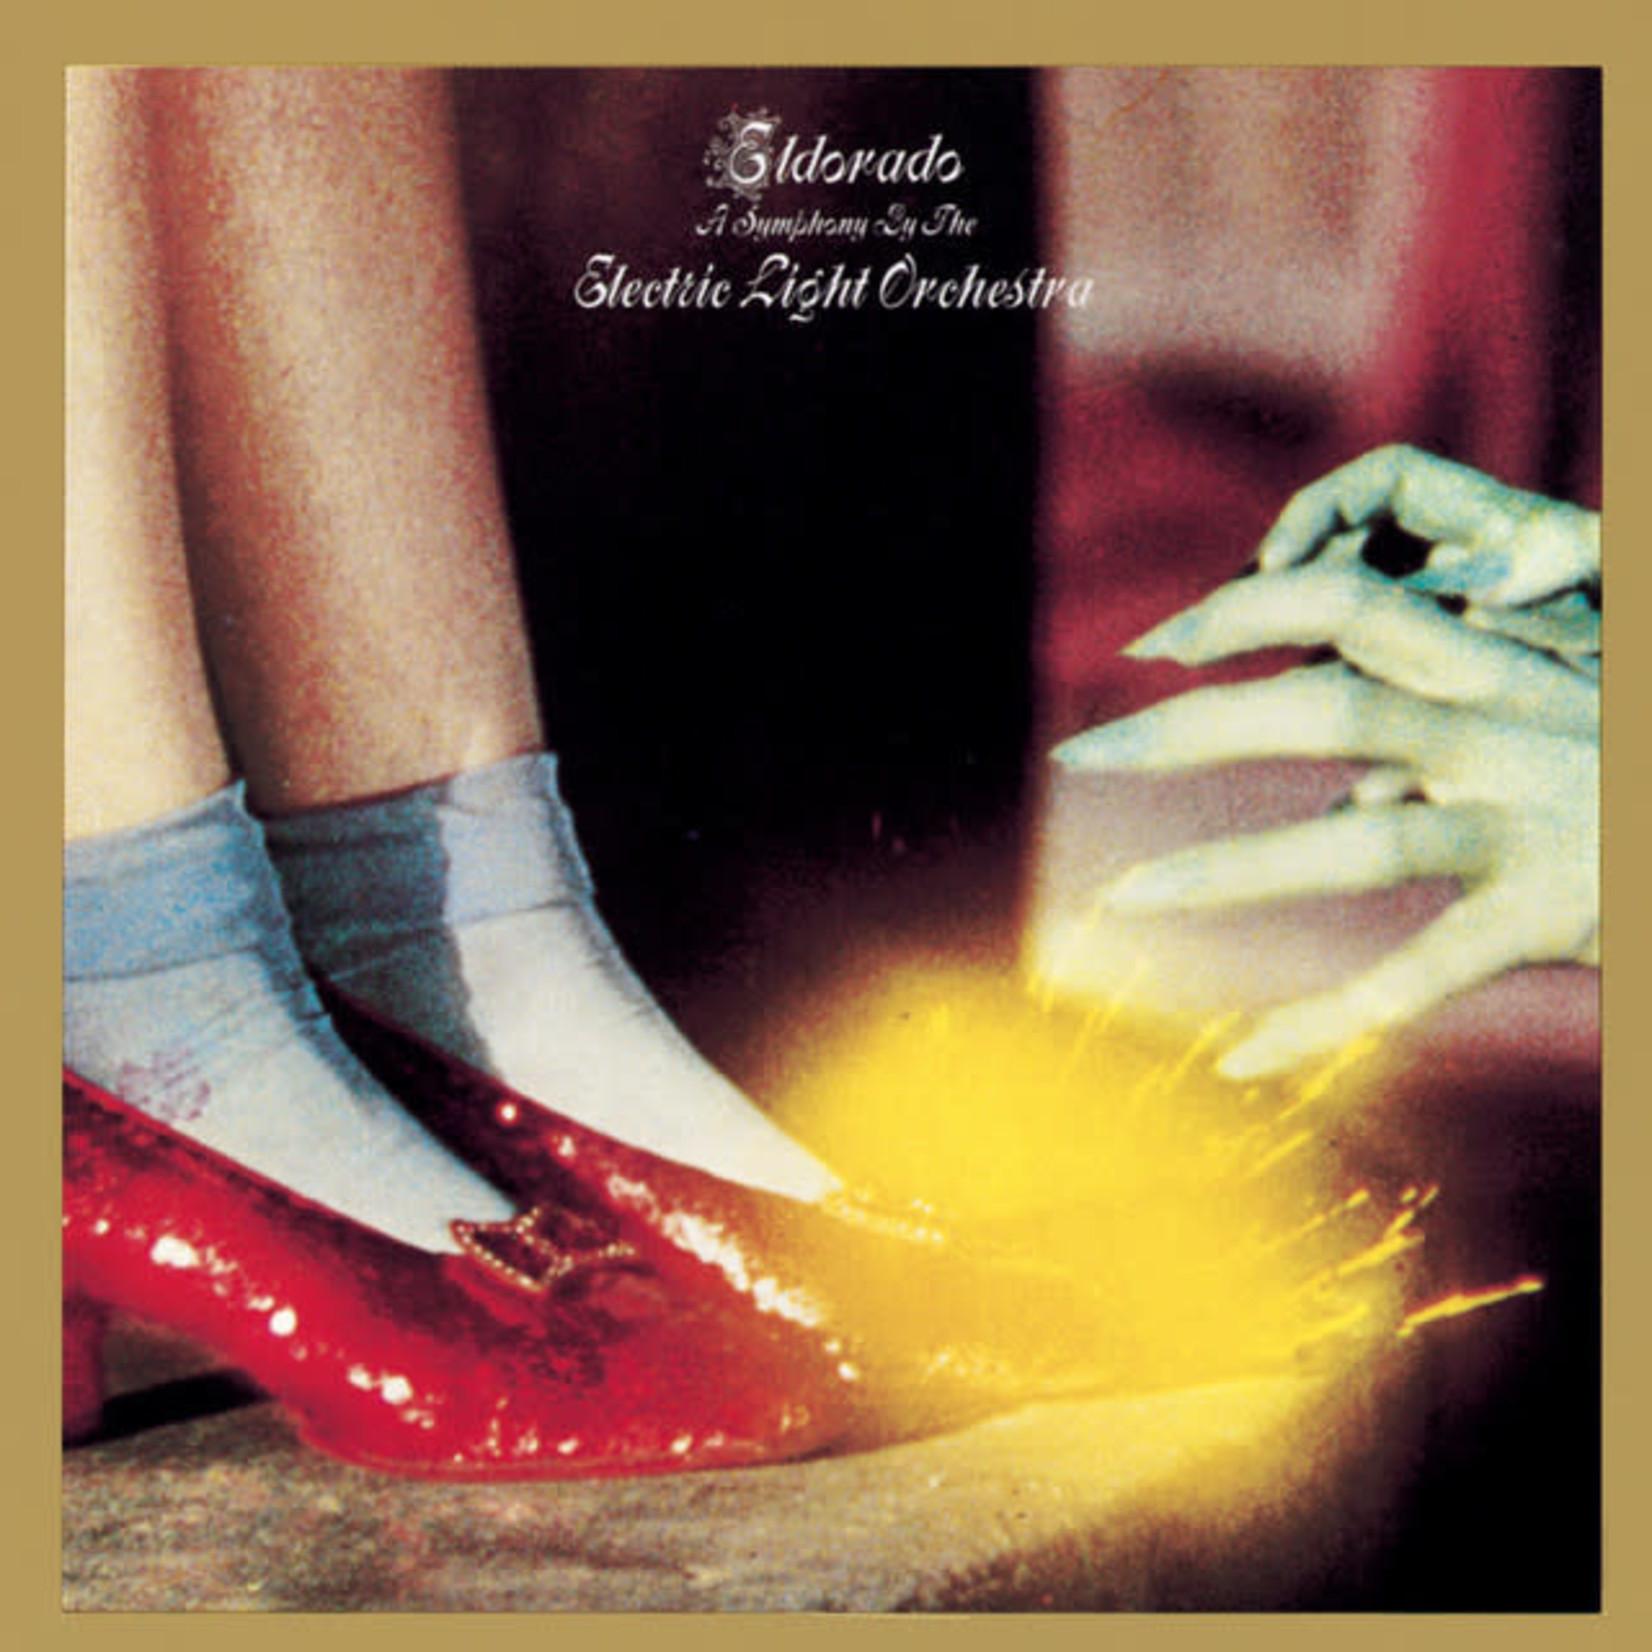 Vinyl Electric Light Orchestra - Eldorado